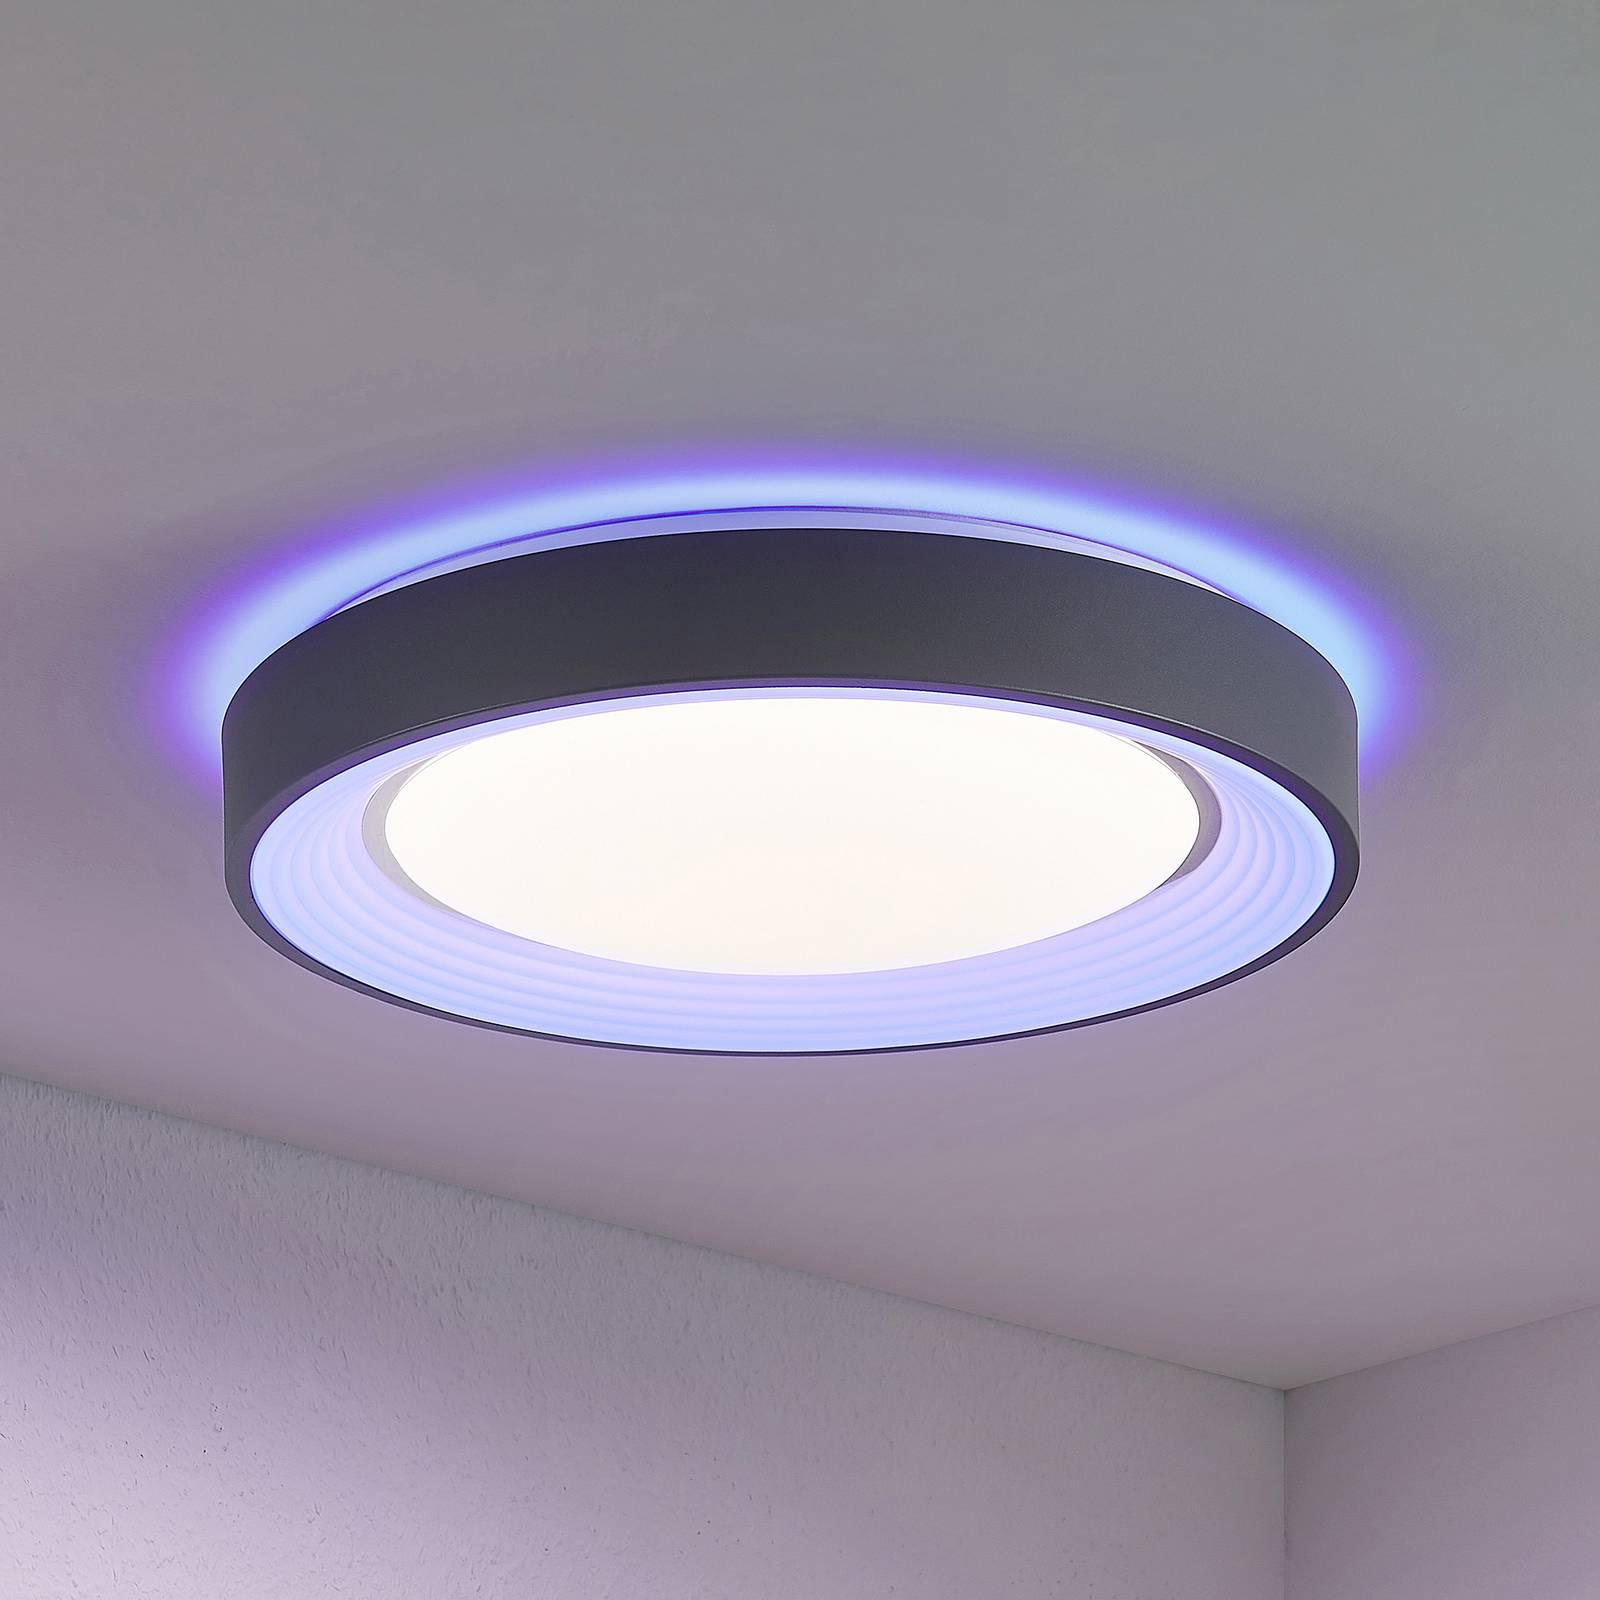 Lindby Lindum LED-Deckenleuchte, RGB, CCT, dimmbar